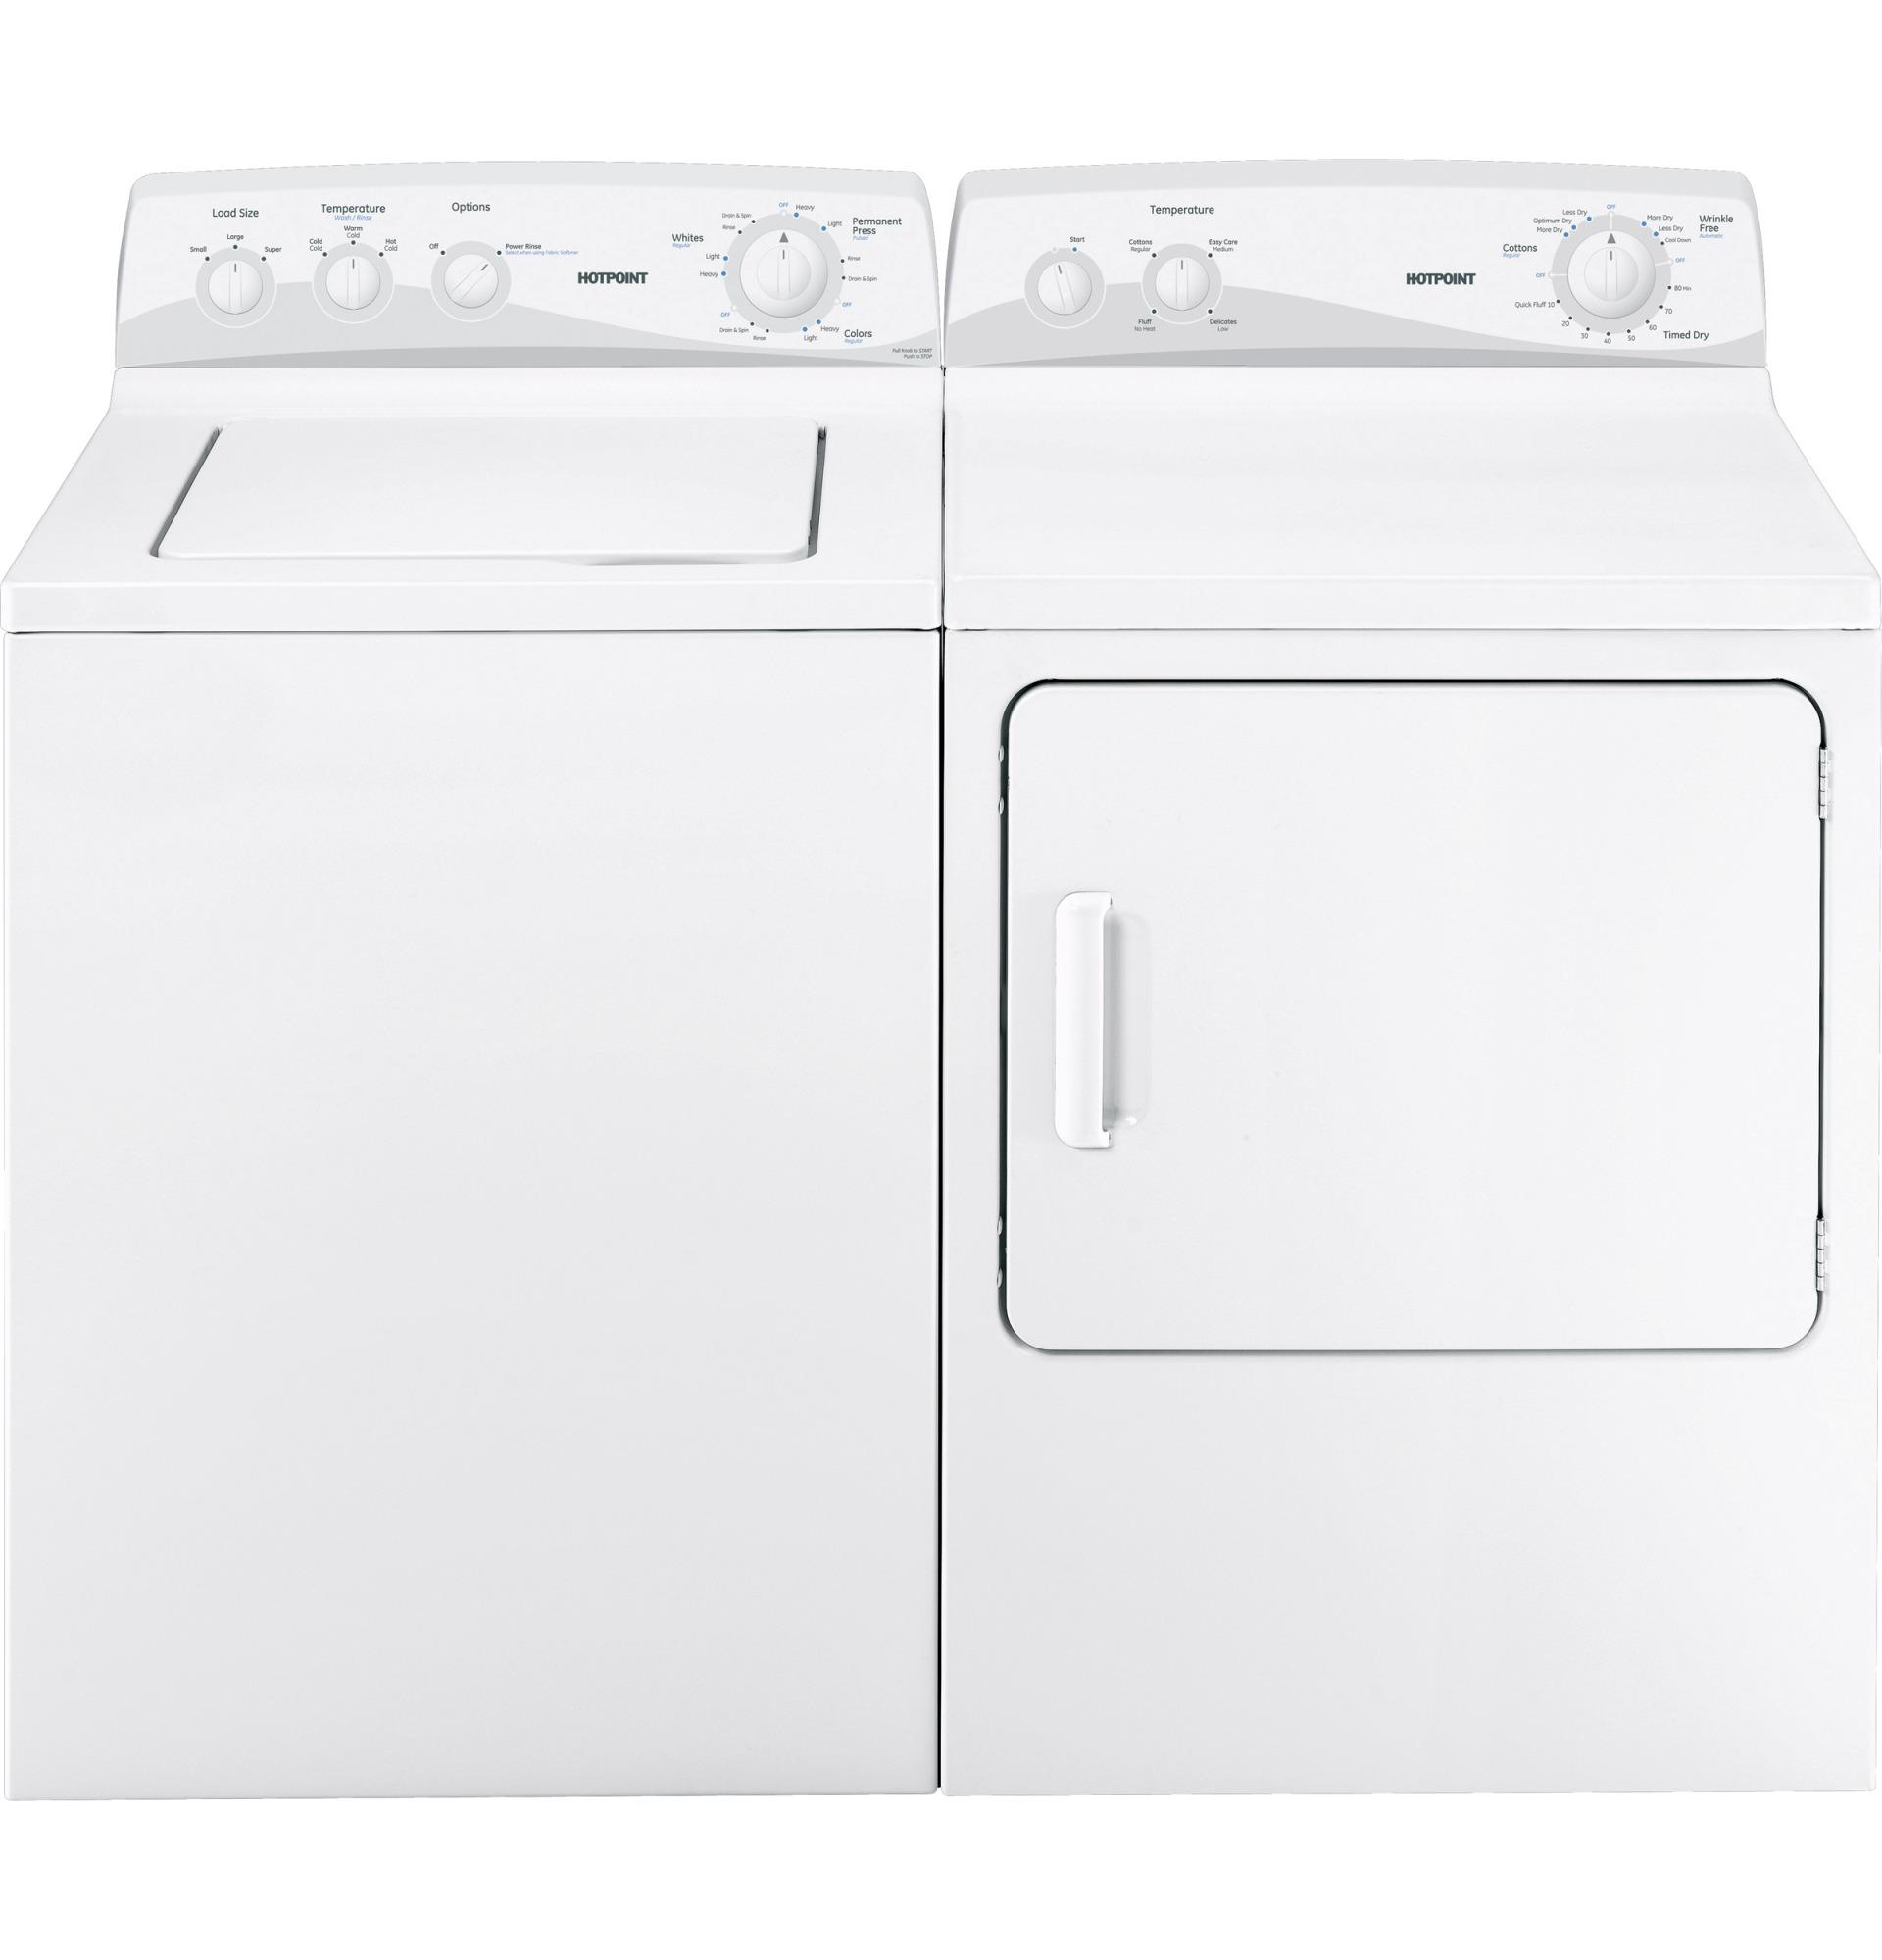 Hotpoint HTDP120EDWW 6.8 cu. ft. Dura Drum Electric Dryer - White